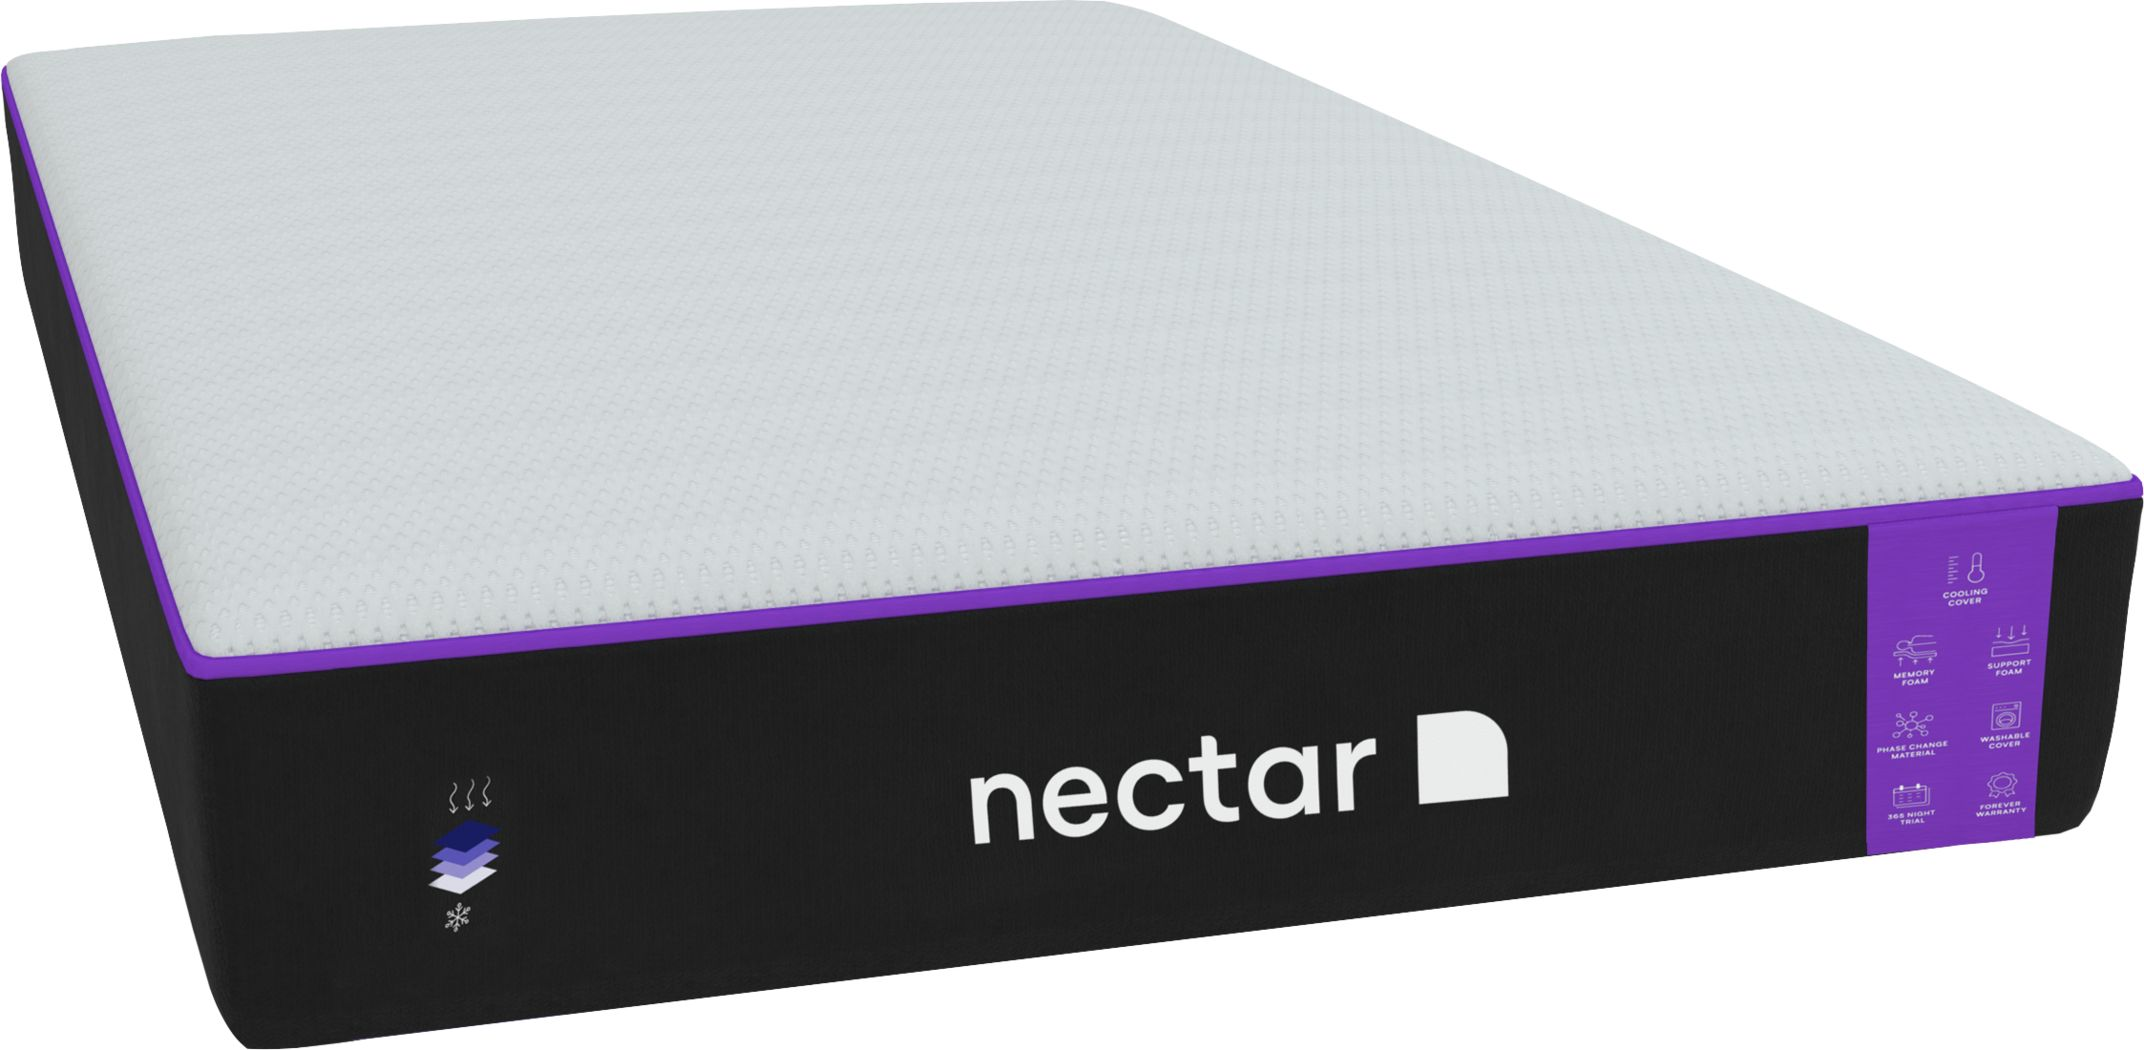 Nectar Premier King Mattress